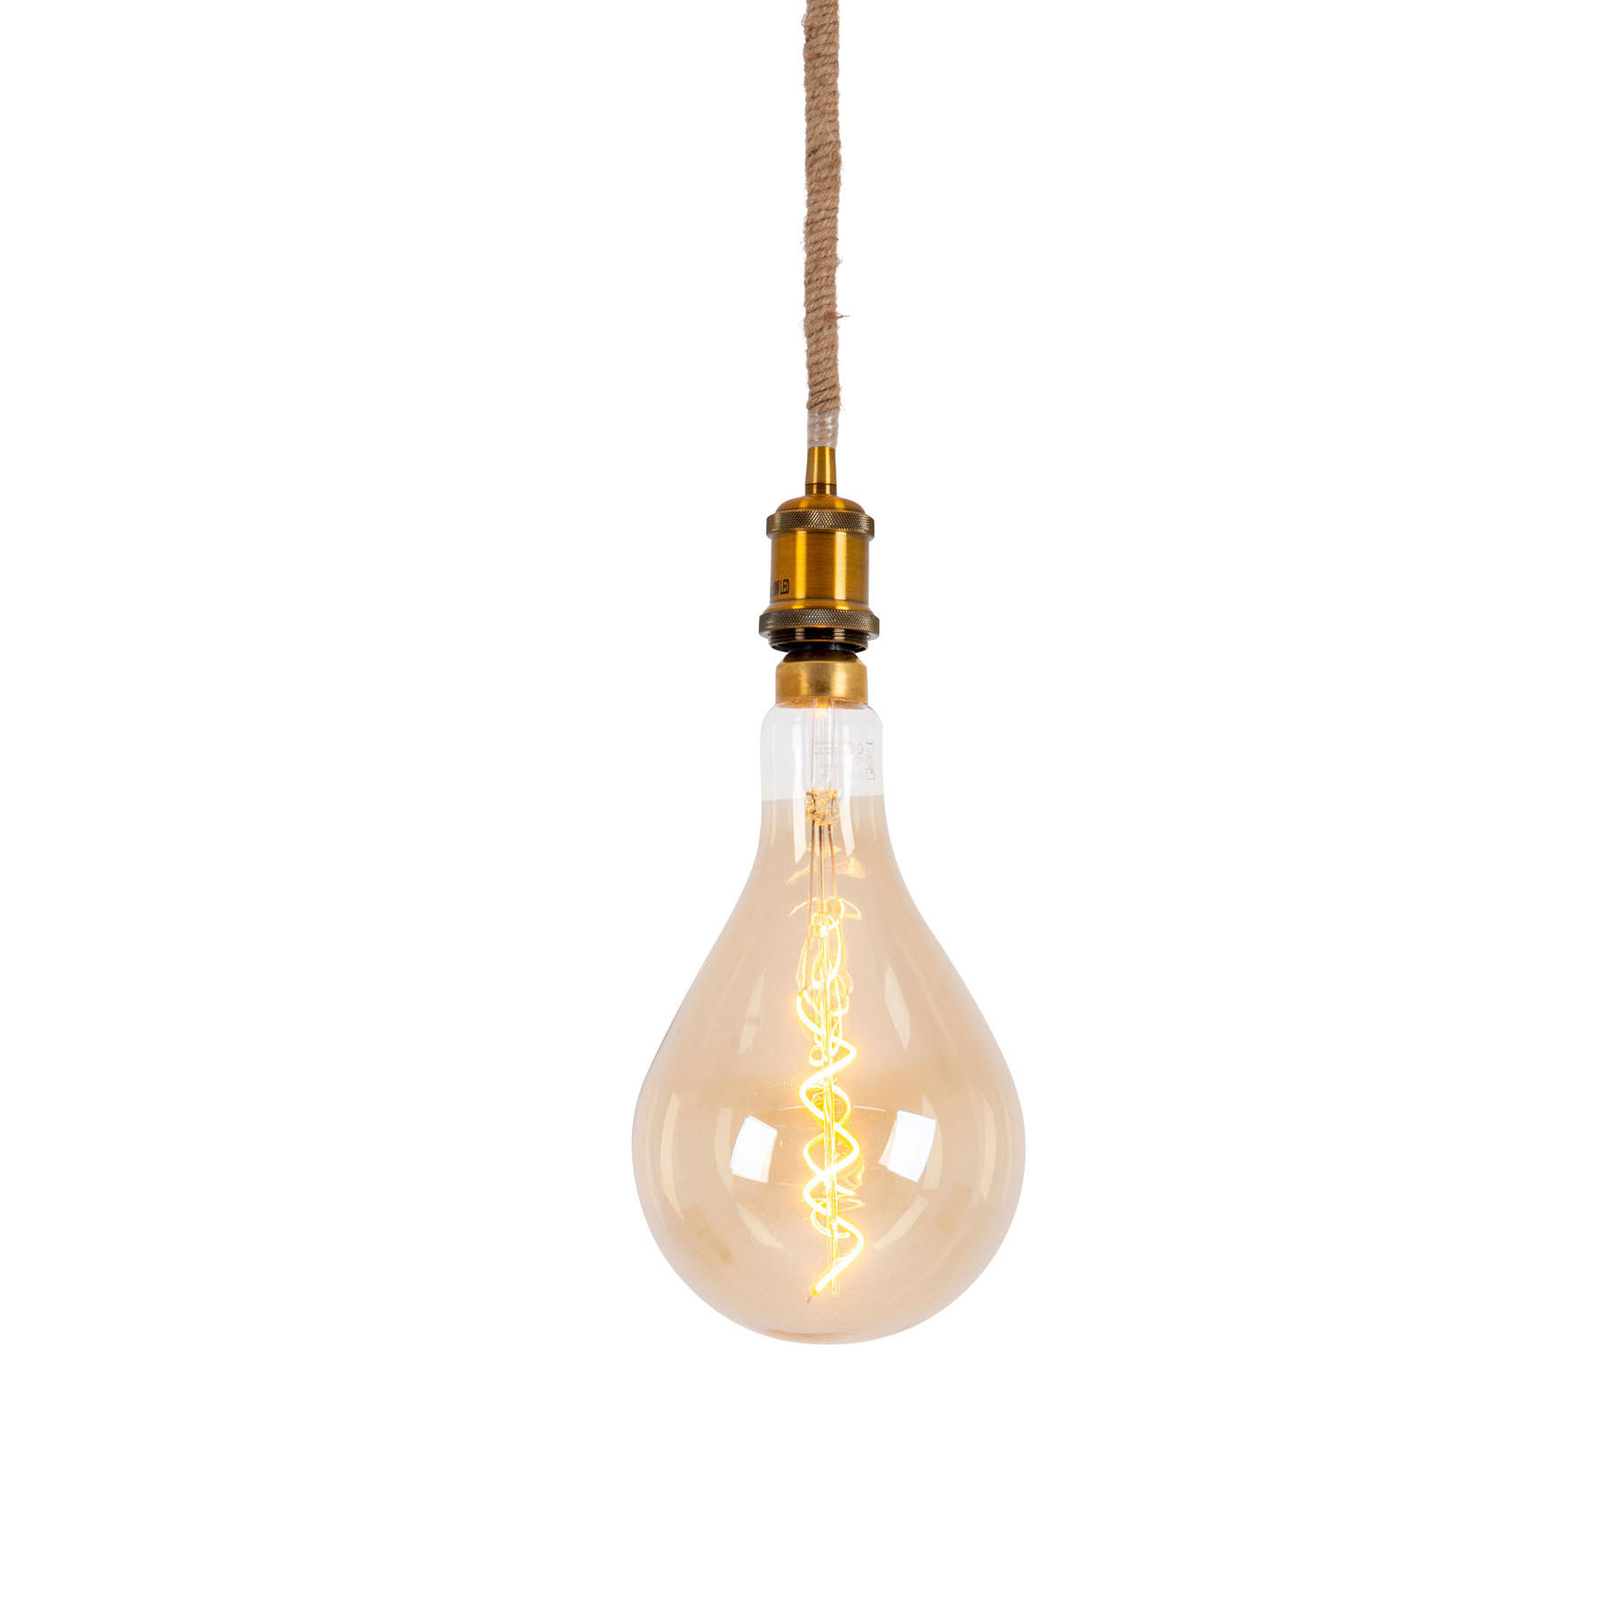 LED hanglamp Ontario, henneptouw, 1-lamp